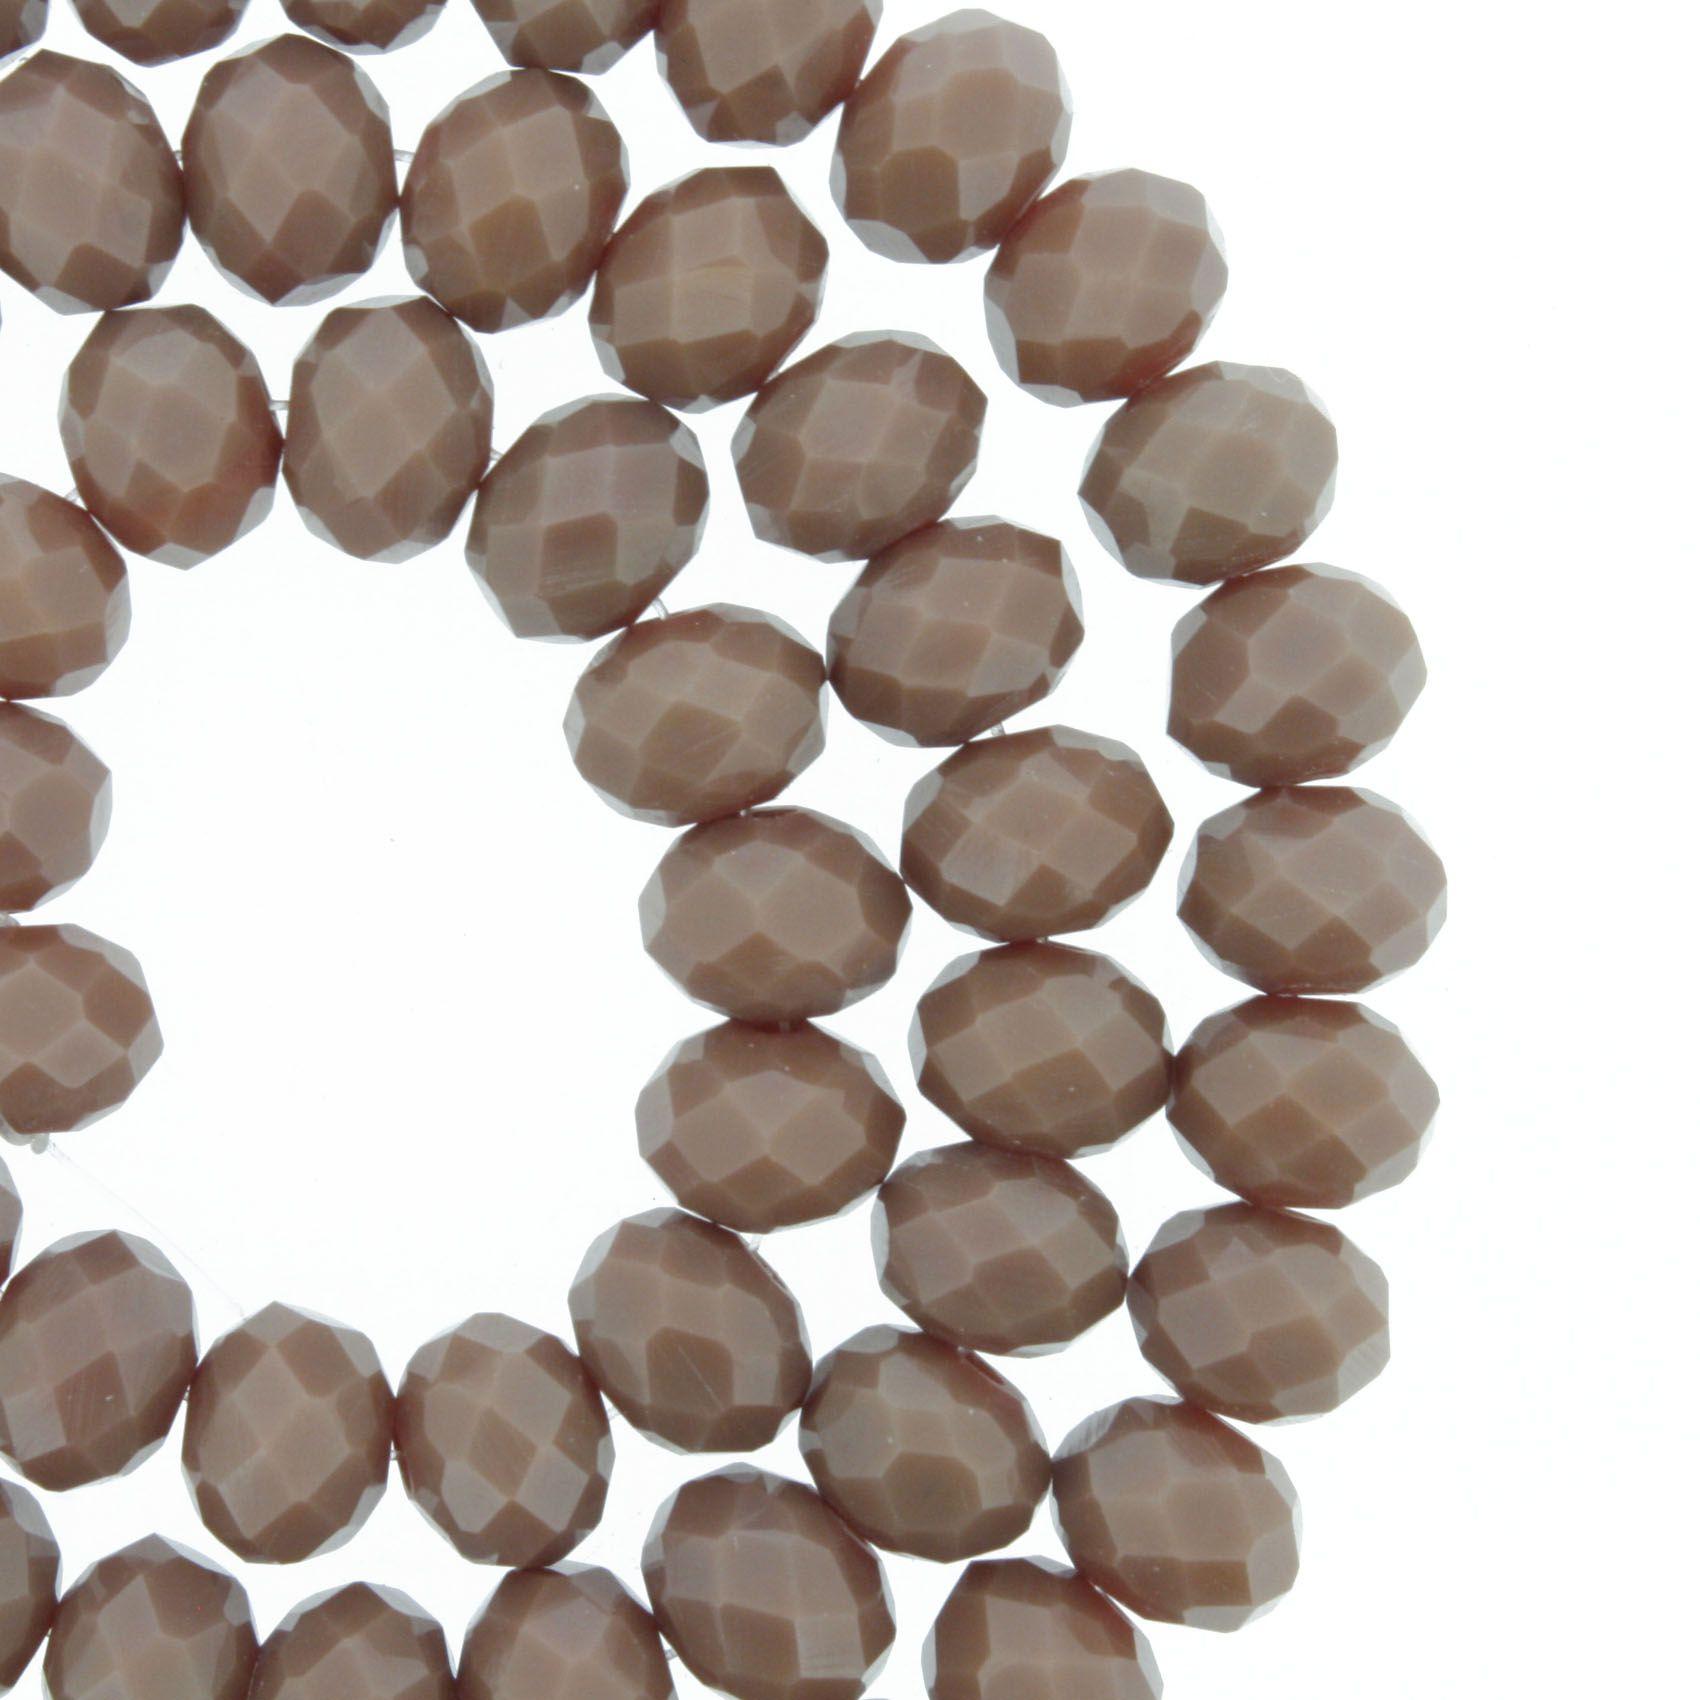 Fio de Cristal - Flat® - Marrom - 8mm  - Stéphanie Bijoux® - Peças para Bijuterias e Artesanato